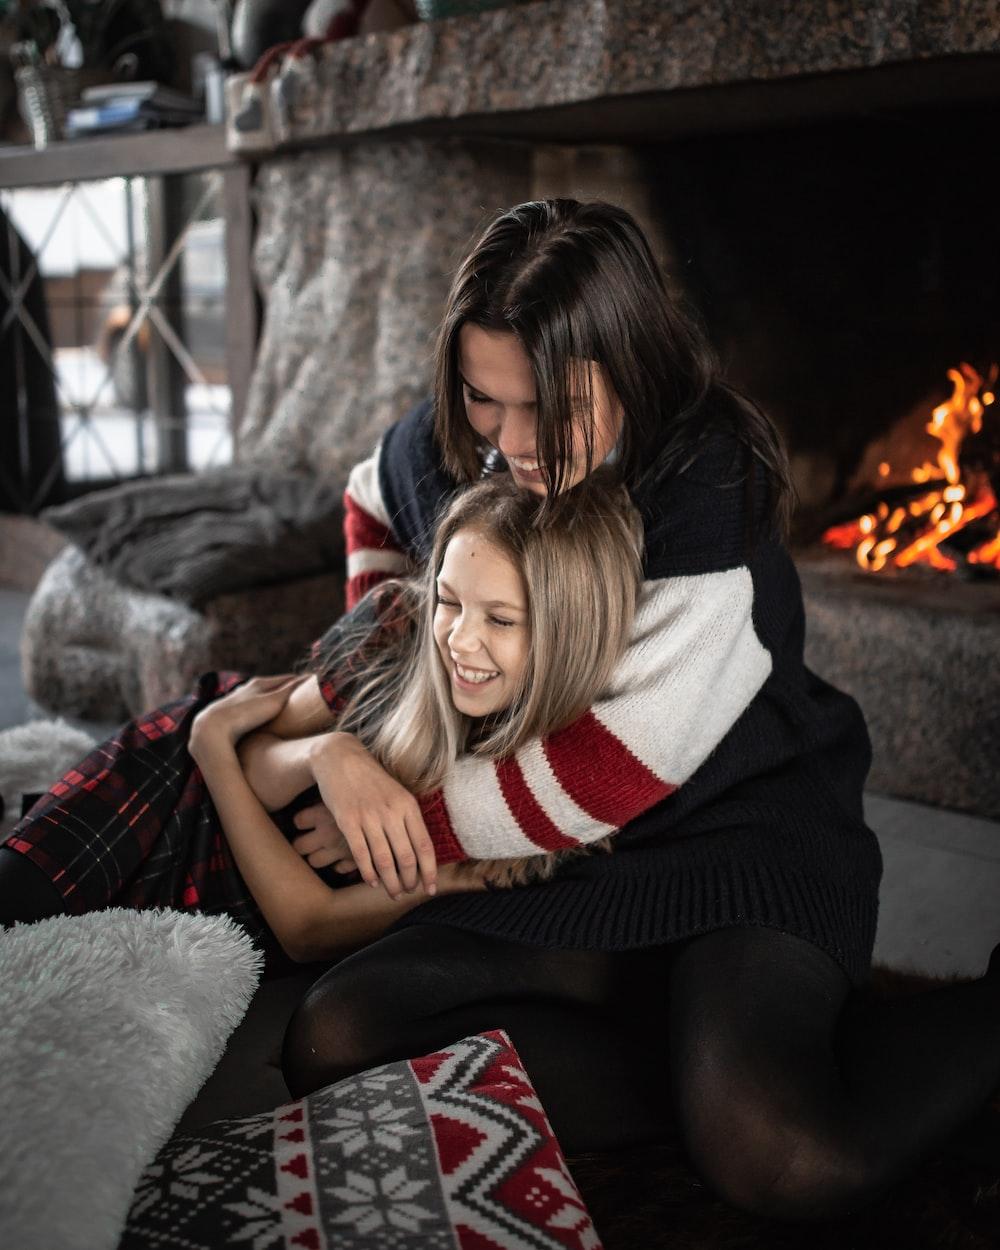 woman hugging girl while sitting near fireplace